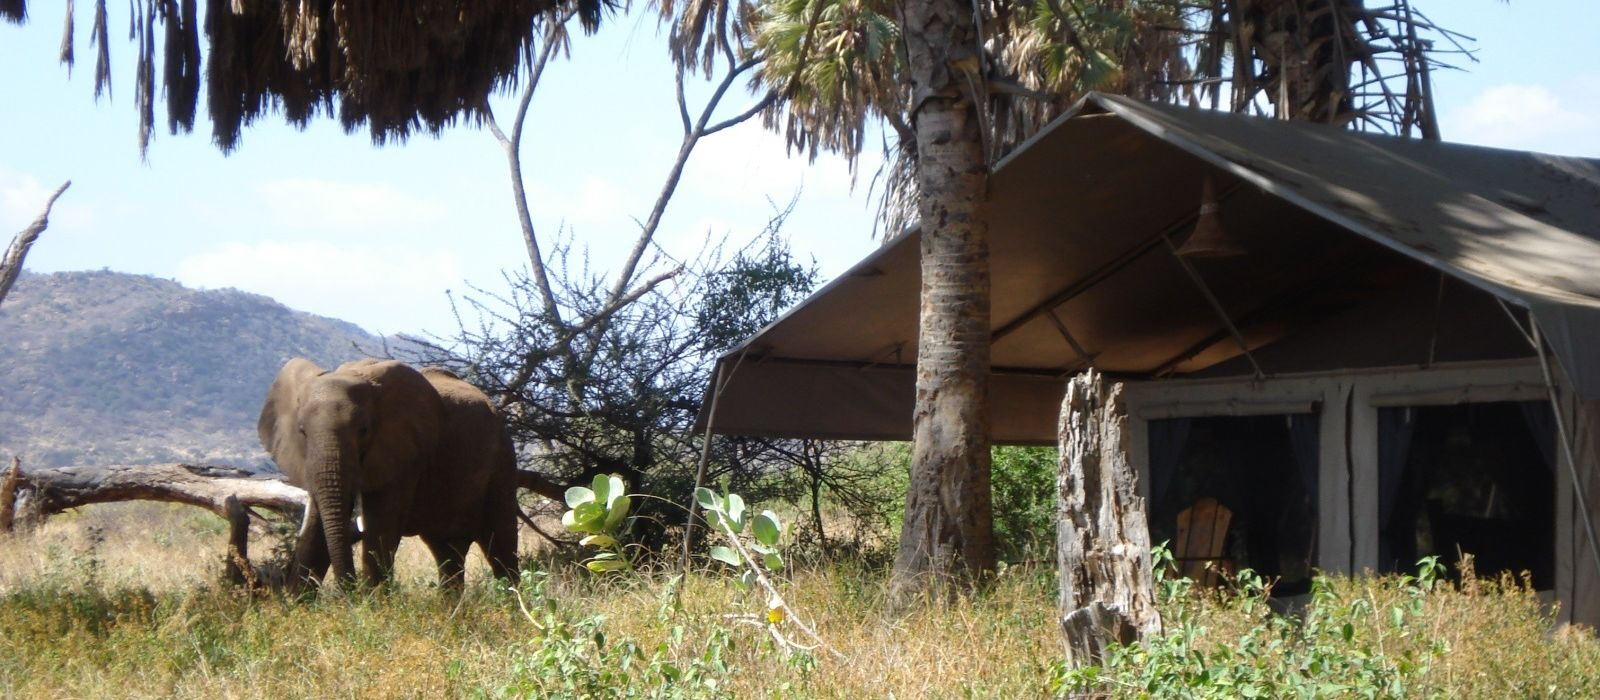 Hotel Elephant Bedroom Camp Kenya